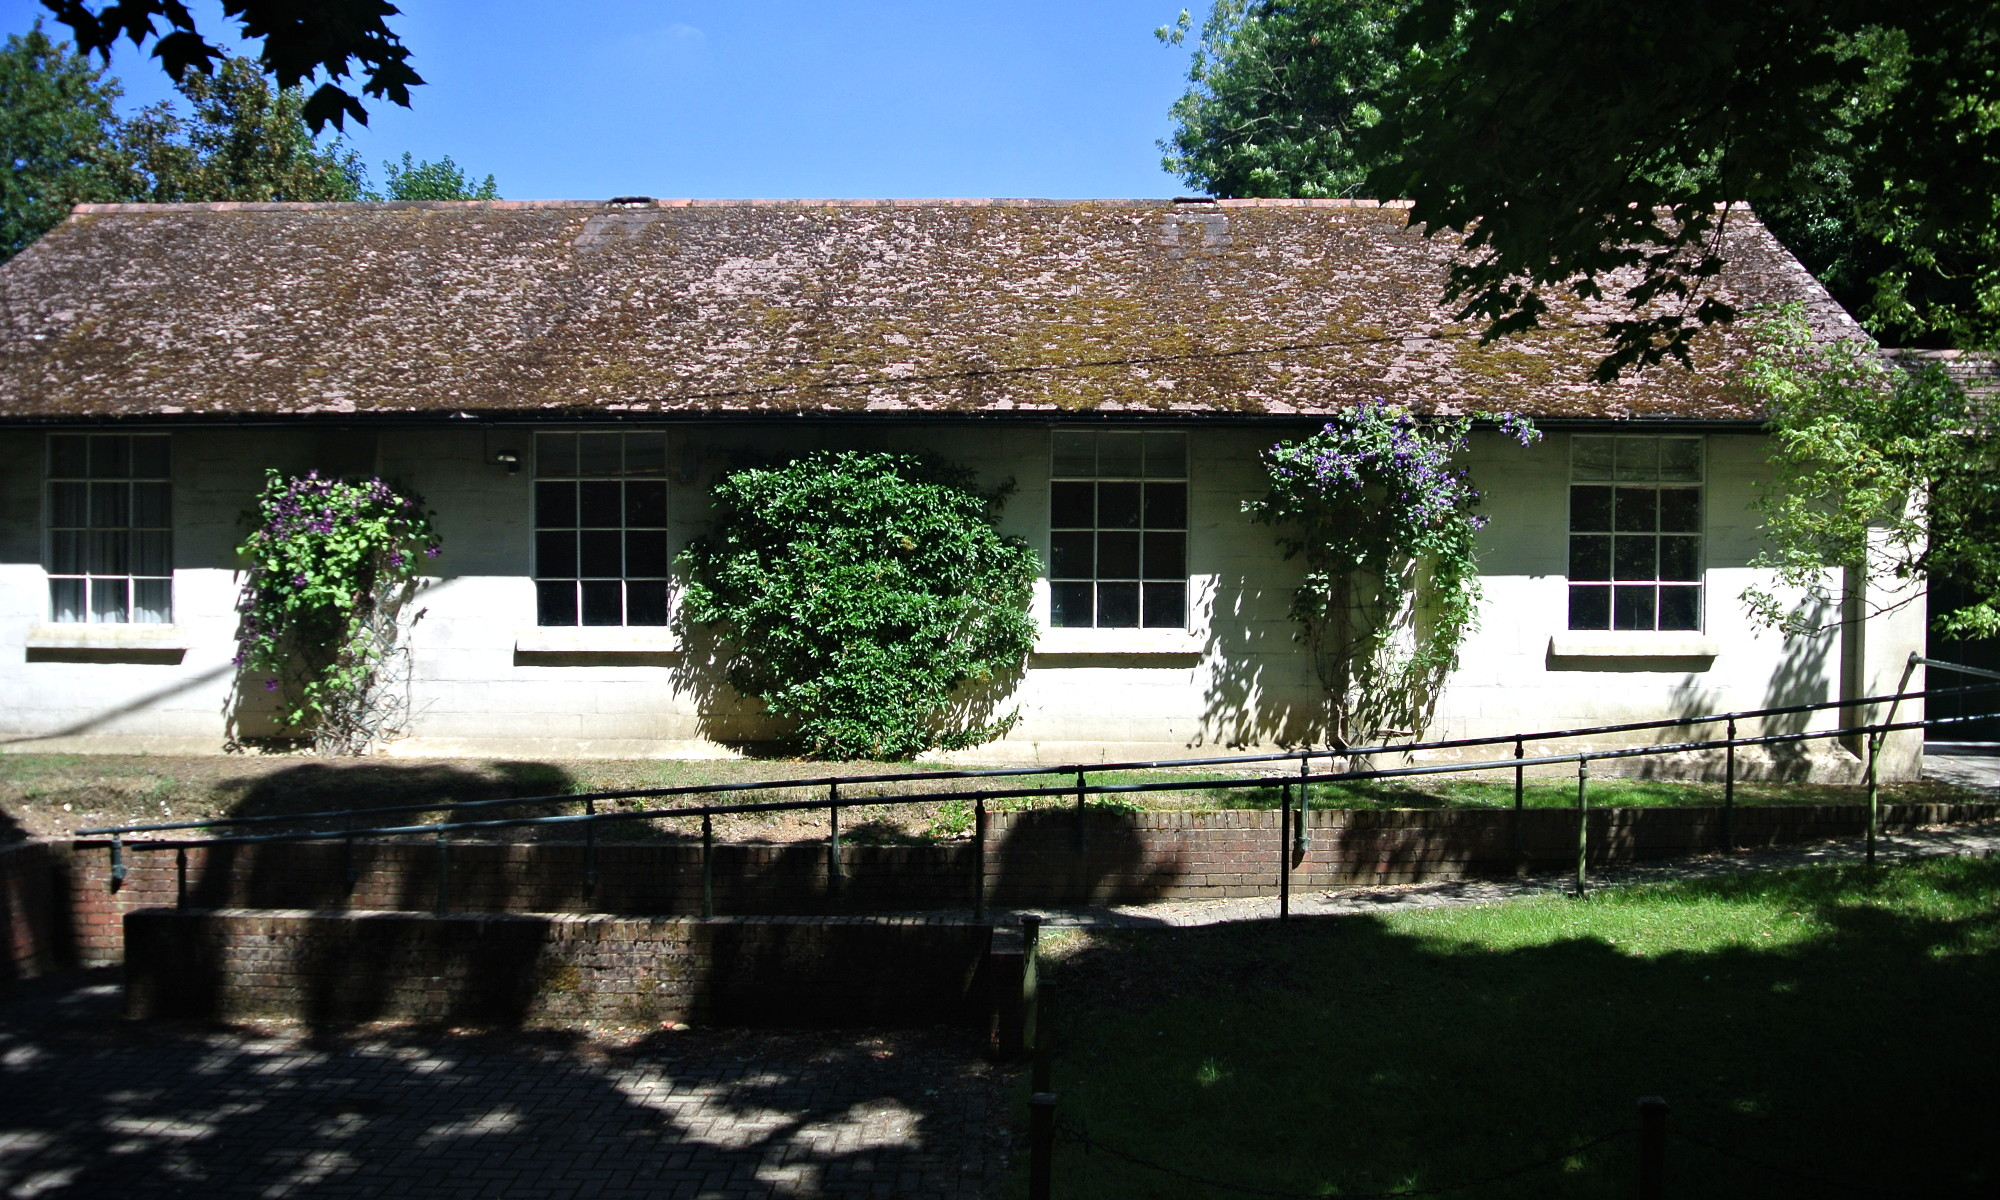 Ellisfield Memorial Hall